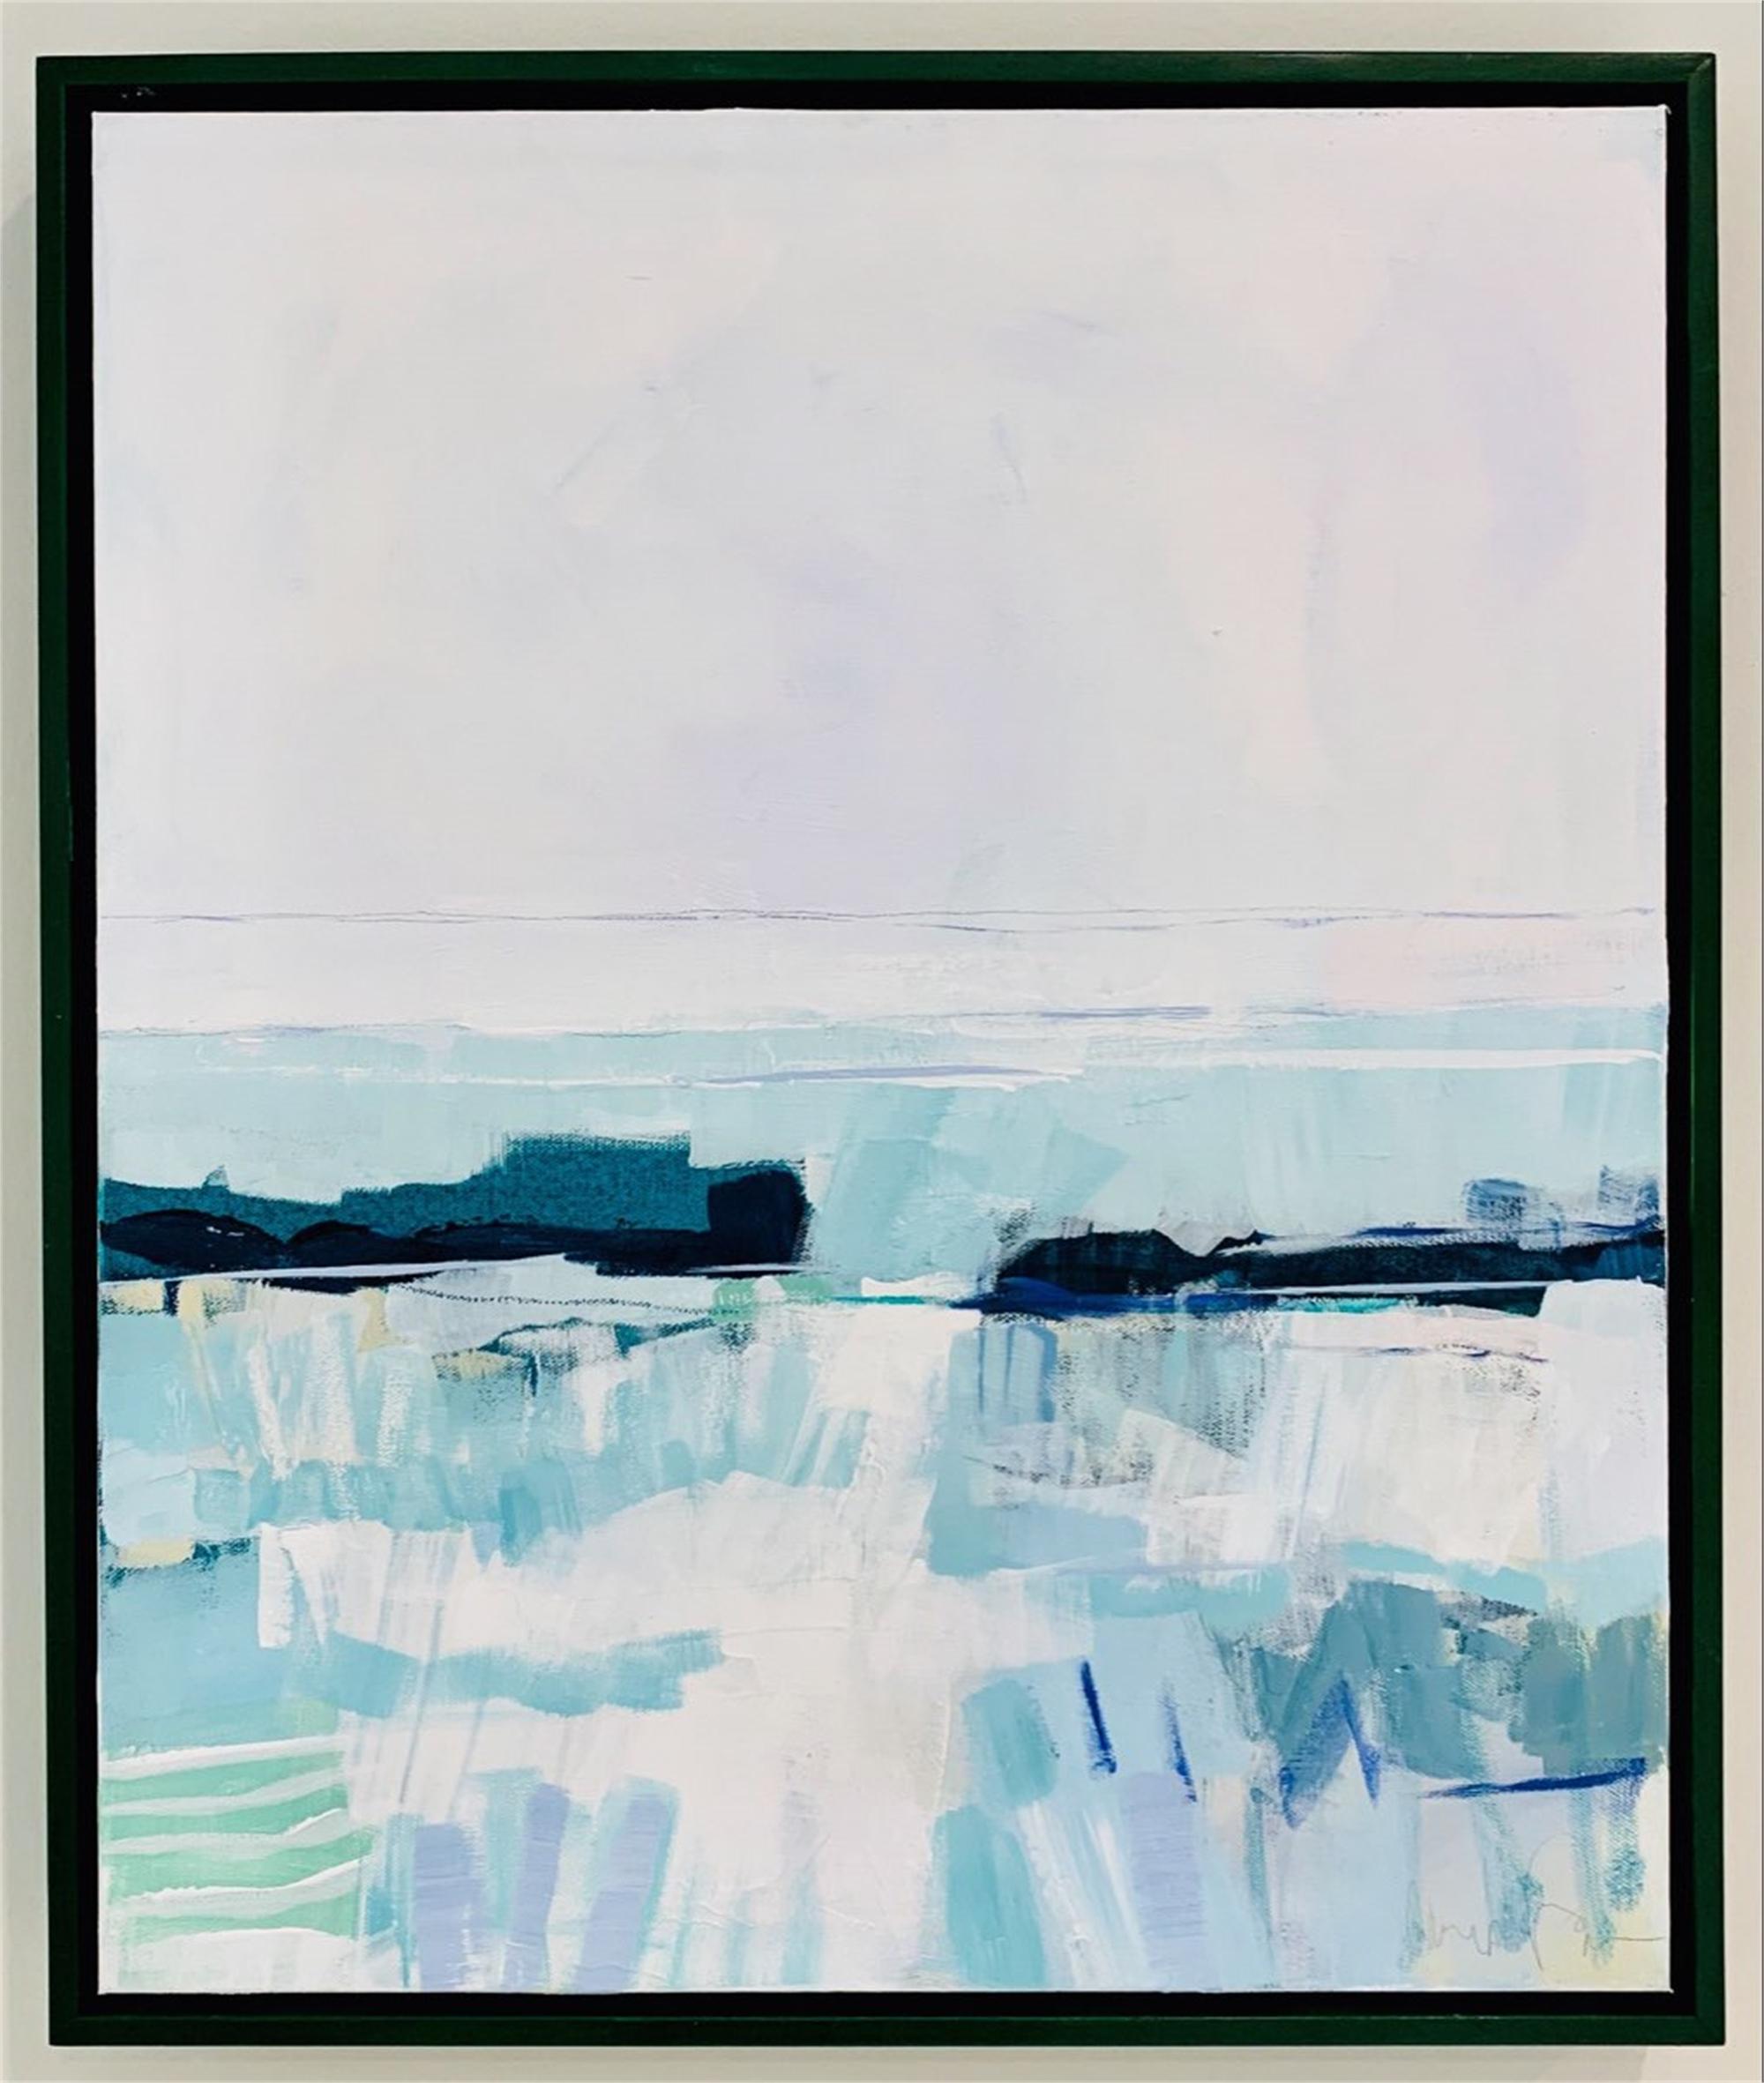 Deleport Point by Caroline Swetenburg